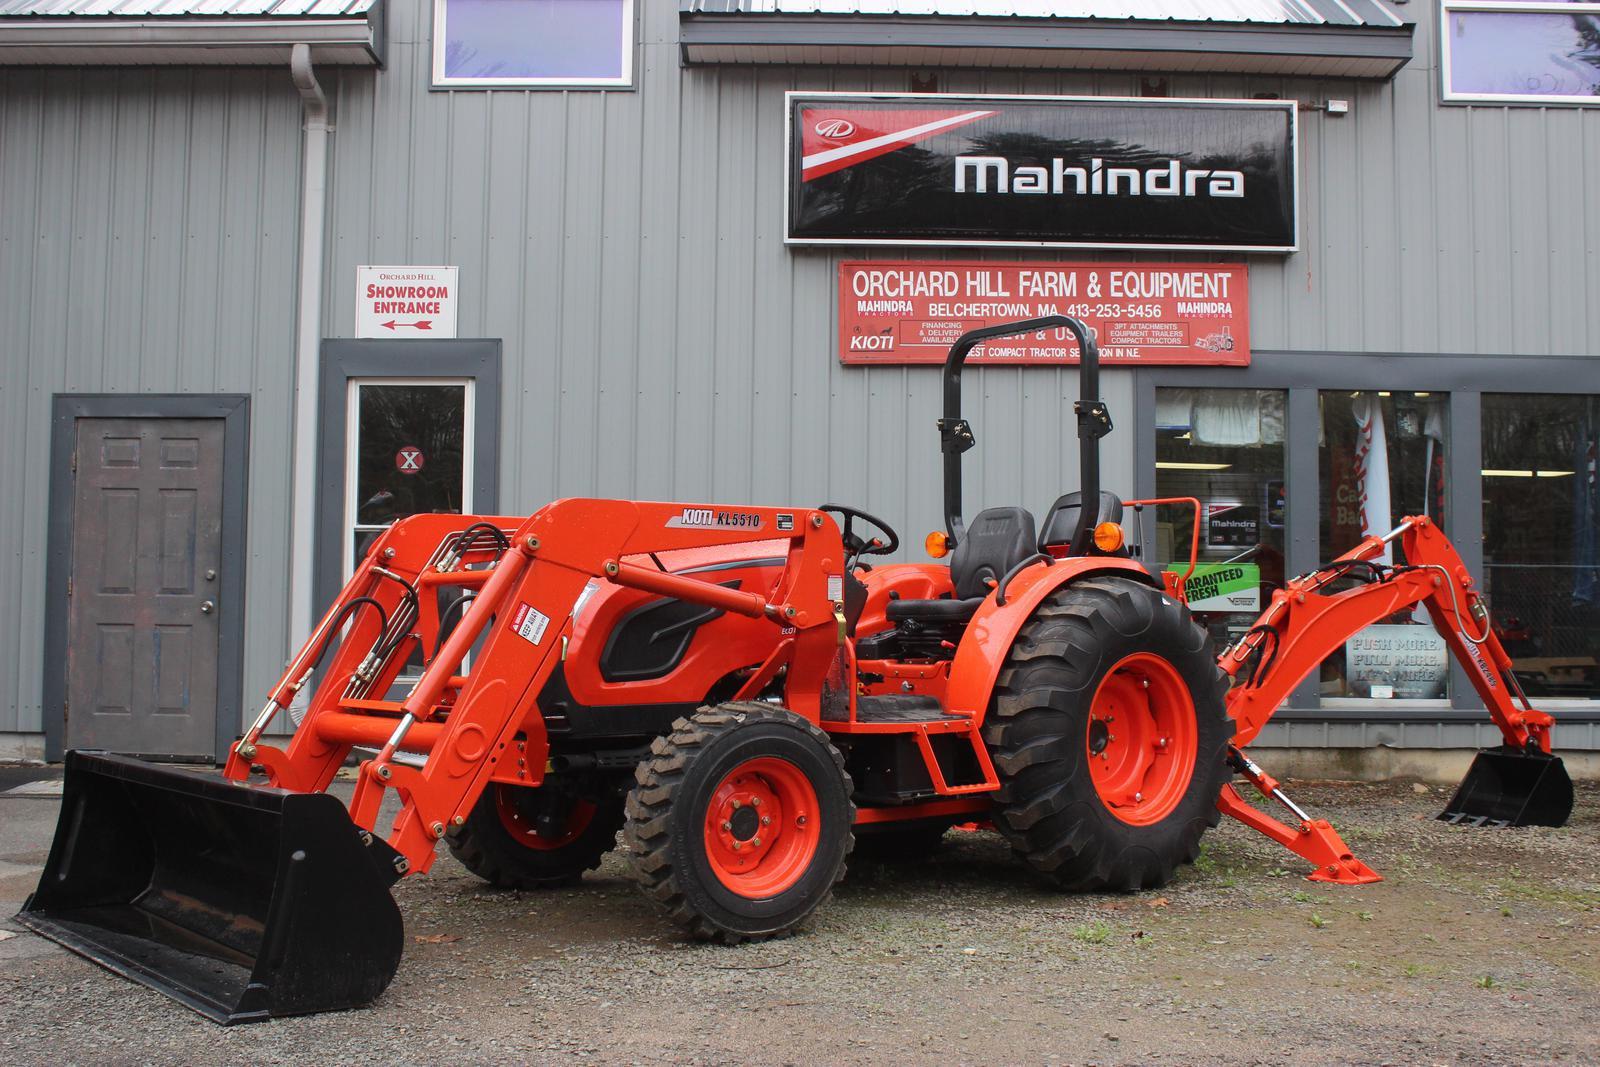 Kioti Tractor Accessories : Kioti compact tractor package deals lamoureph